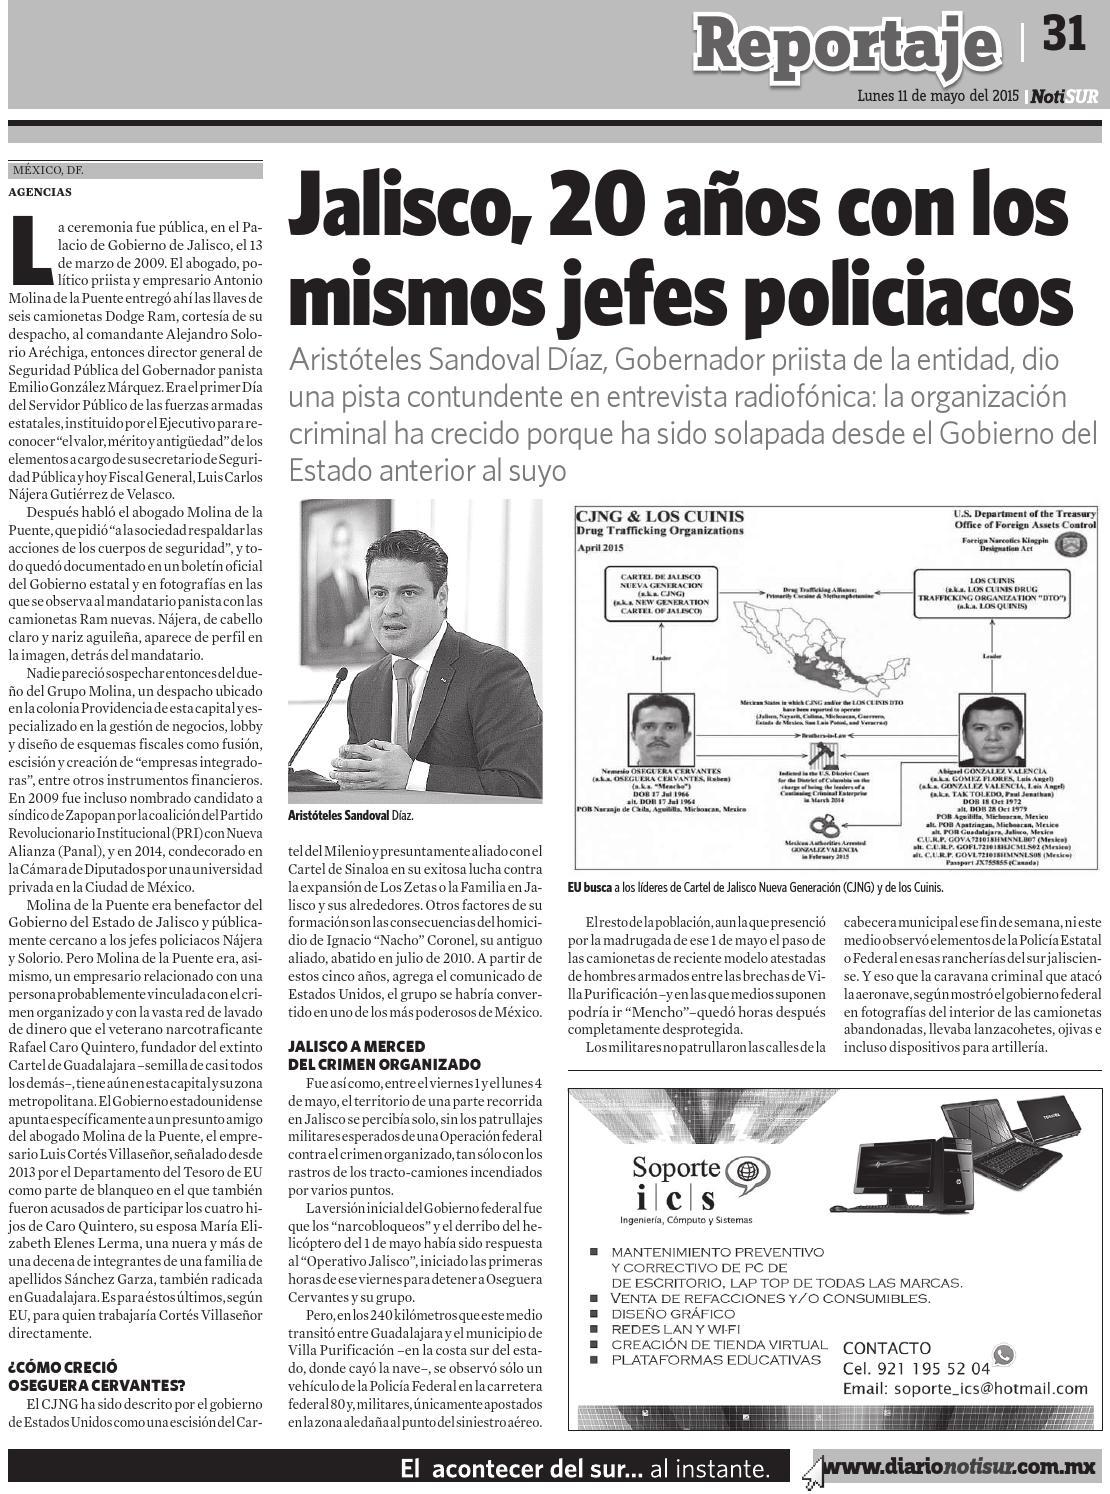 NotiSUR 11 de mayo 2015 by Diario NotiSUR Coatzacoalcos 2015